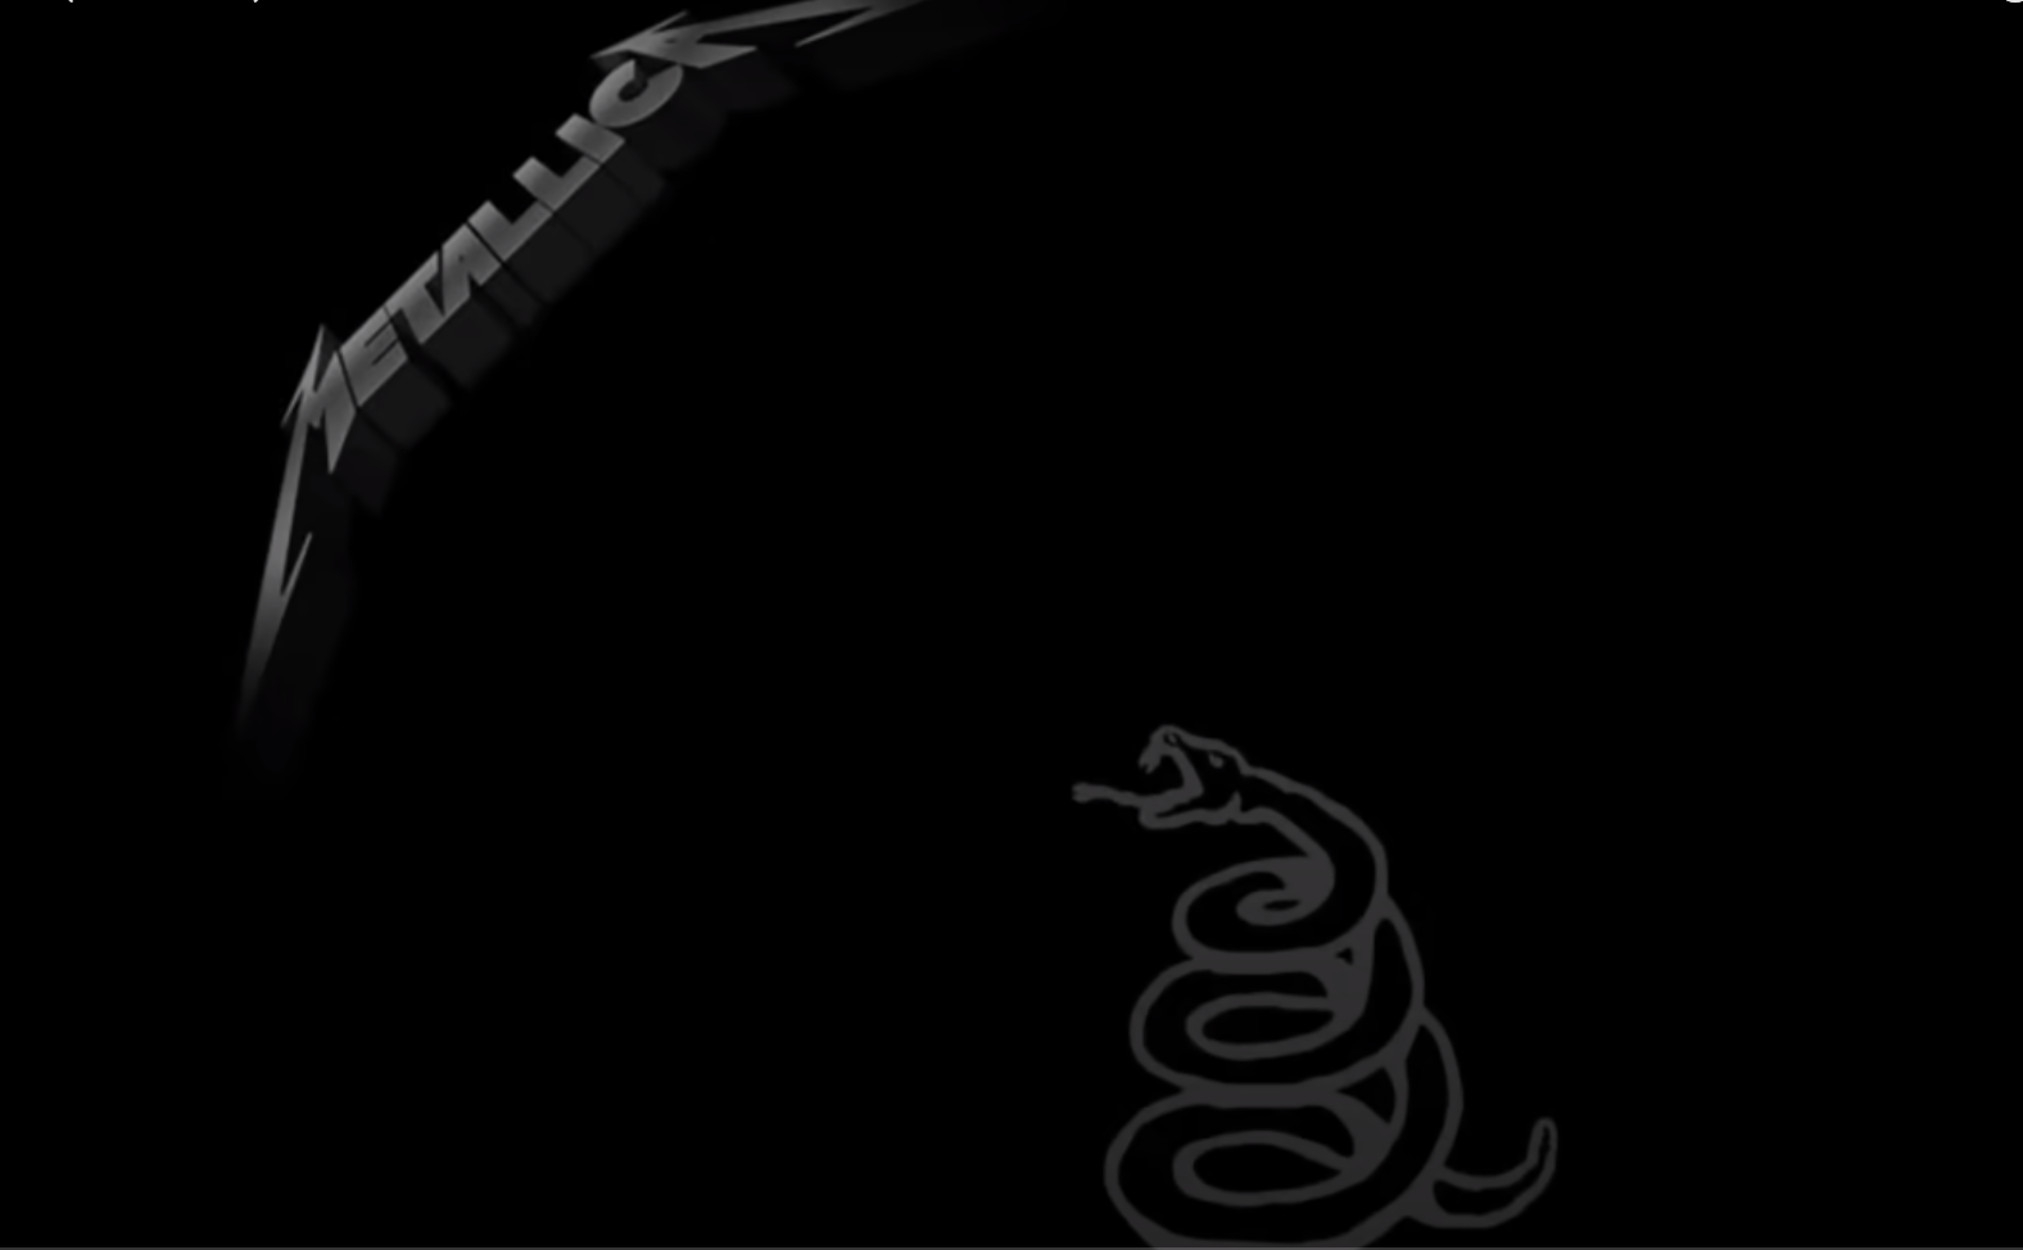 Metallica: 30 χρόνια «Black Album» – Επανακυκλοφορεί σε 2 εκδόσεις ο θρυλικός δίσκος (pic,video)